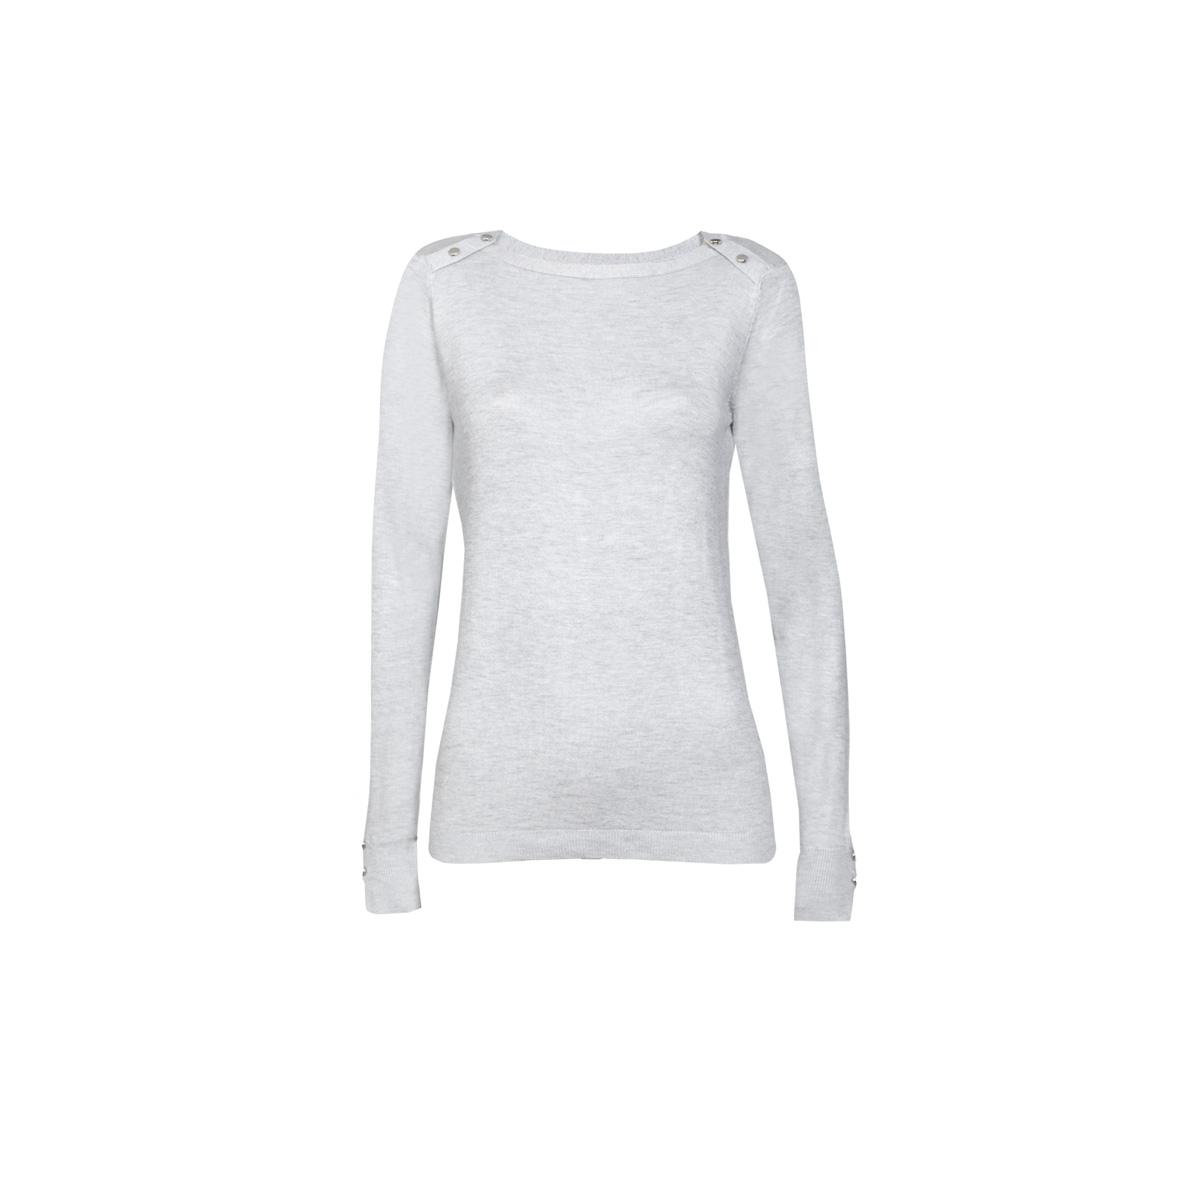 Ženski pulover, melange siva